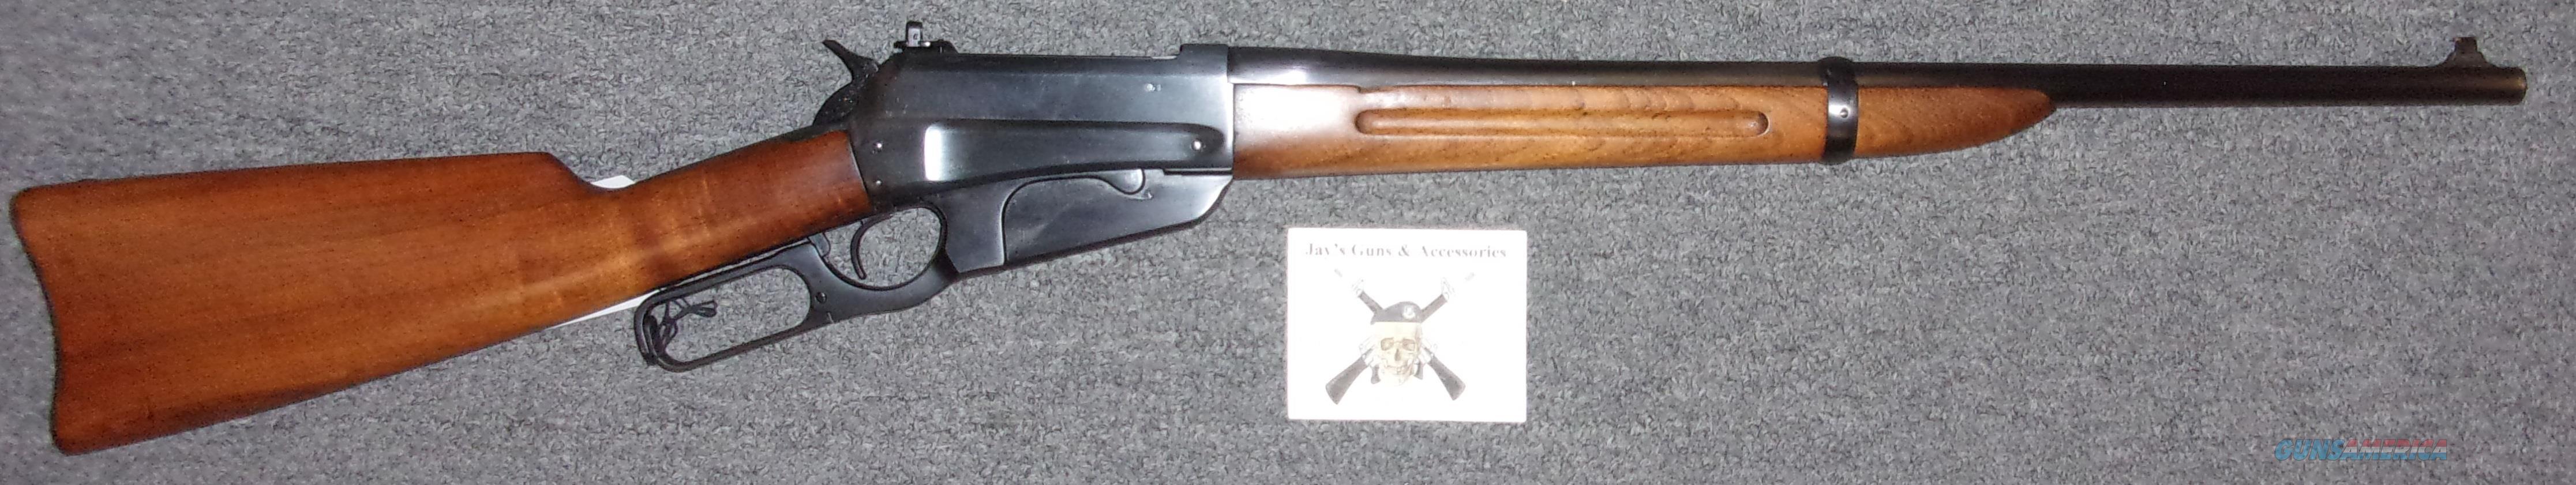 Winchester 1895 Carbine  Guns > Rifles > Winchester Rifles - Pre-1899 Lever